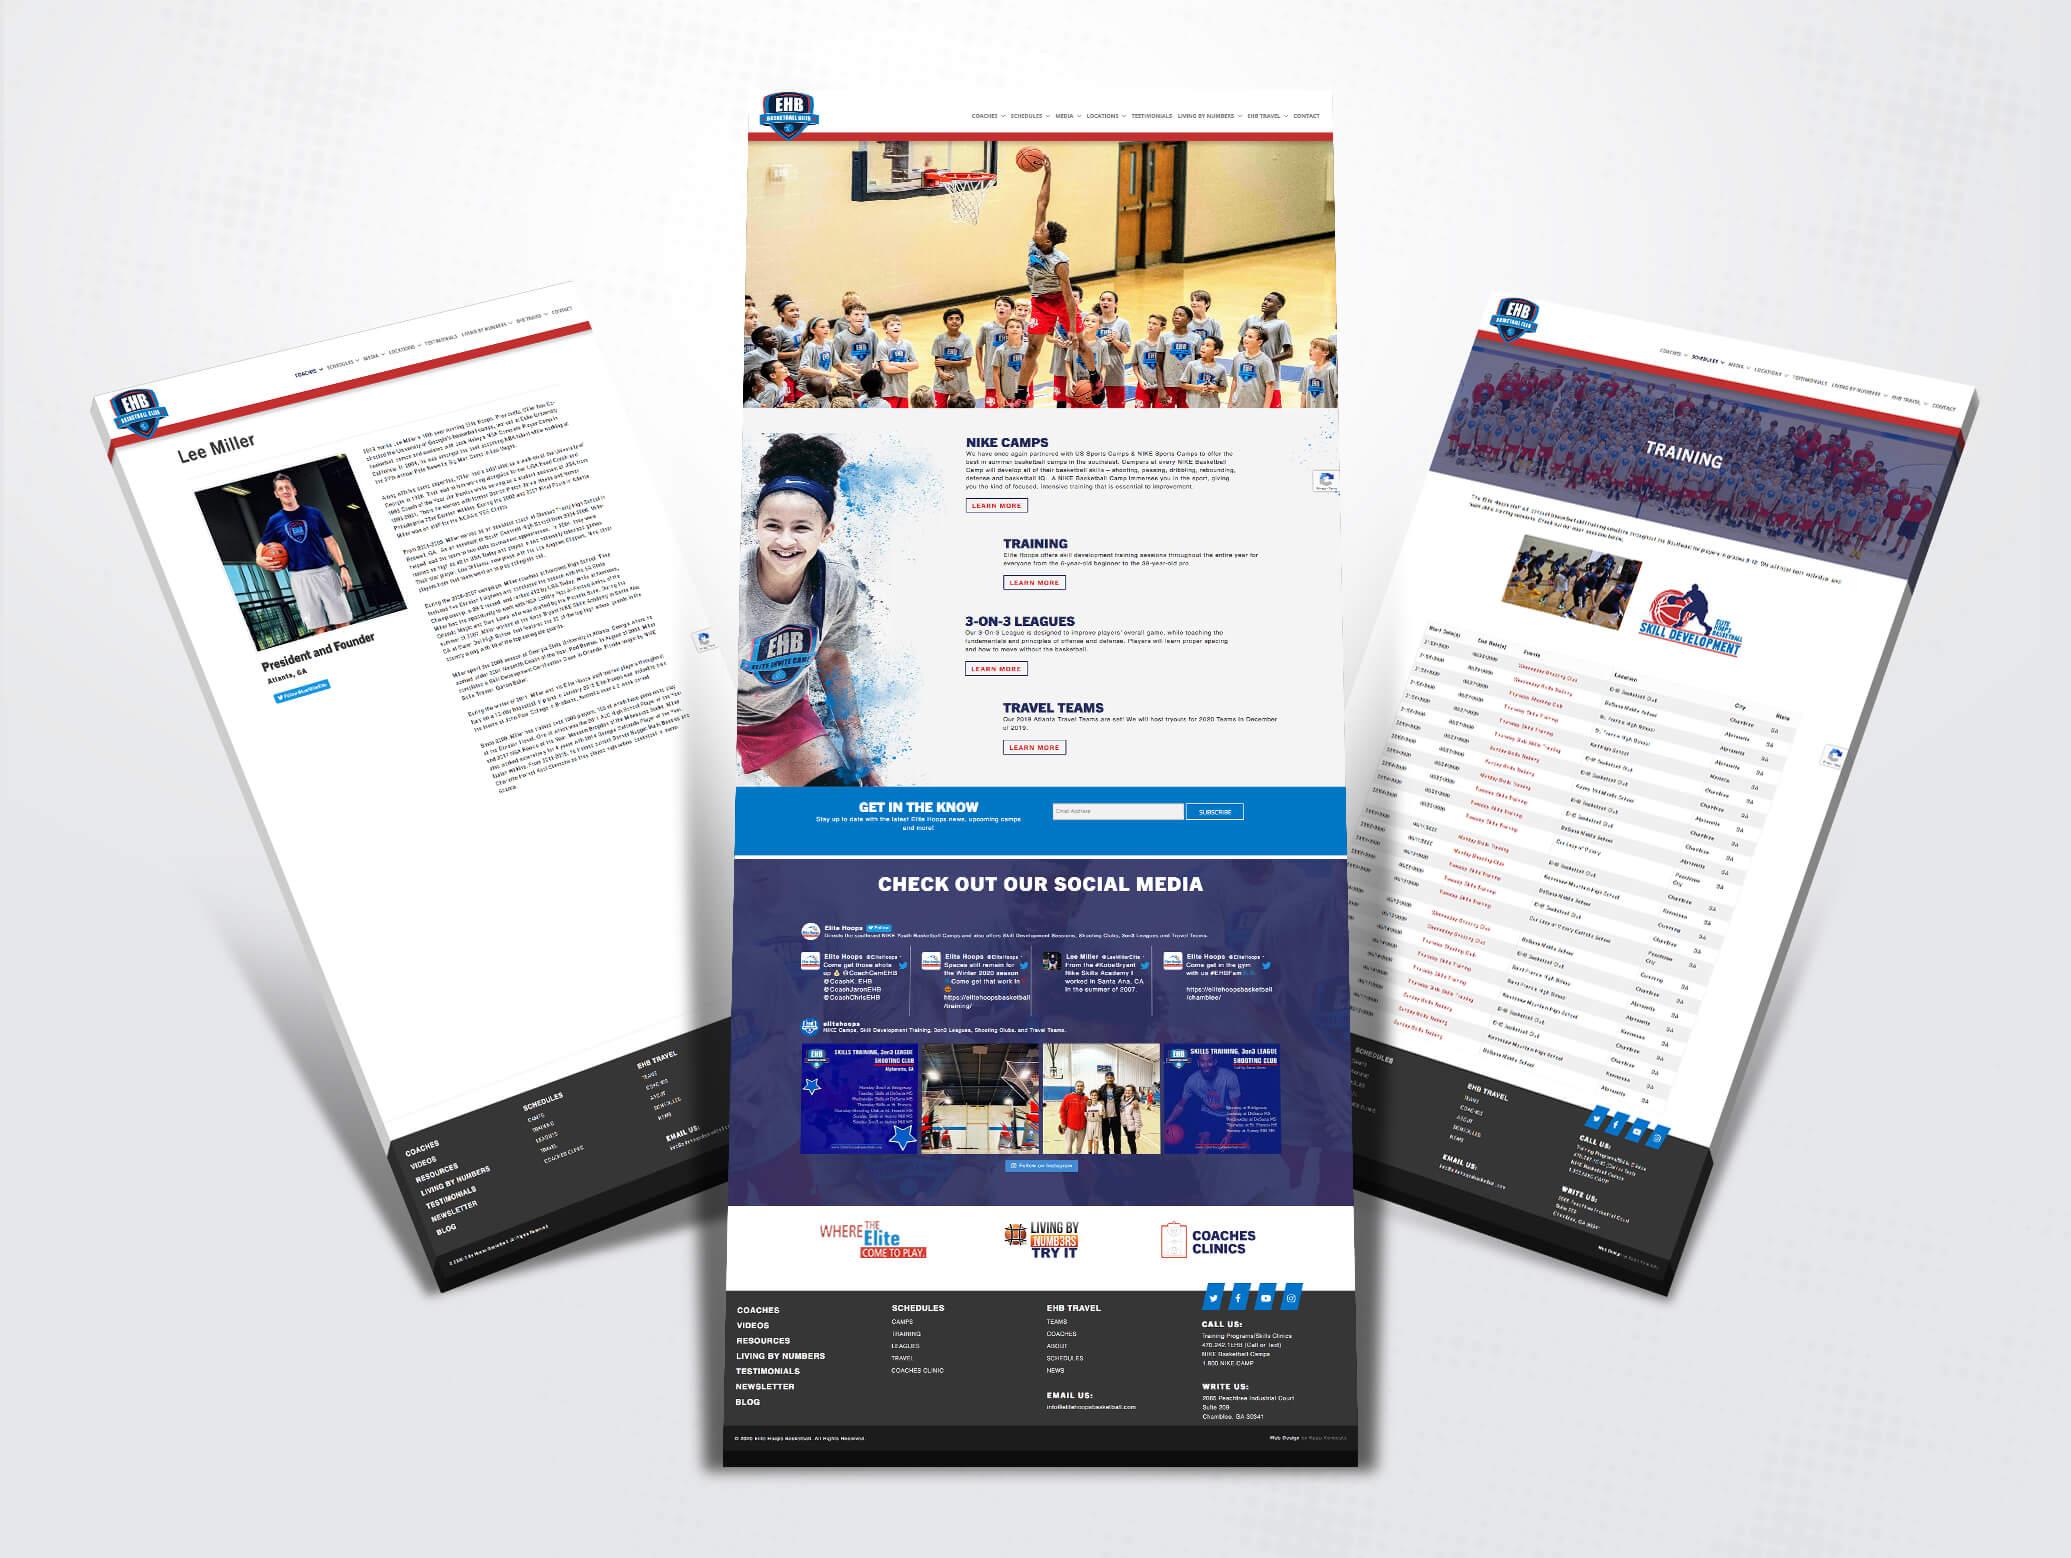 elite hoops basketball website images